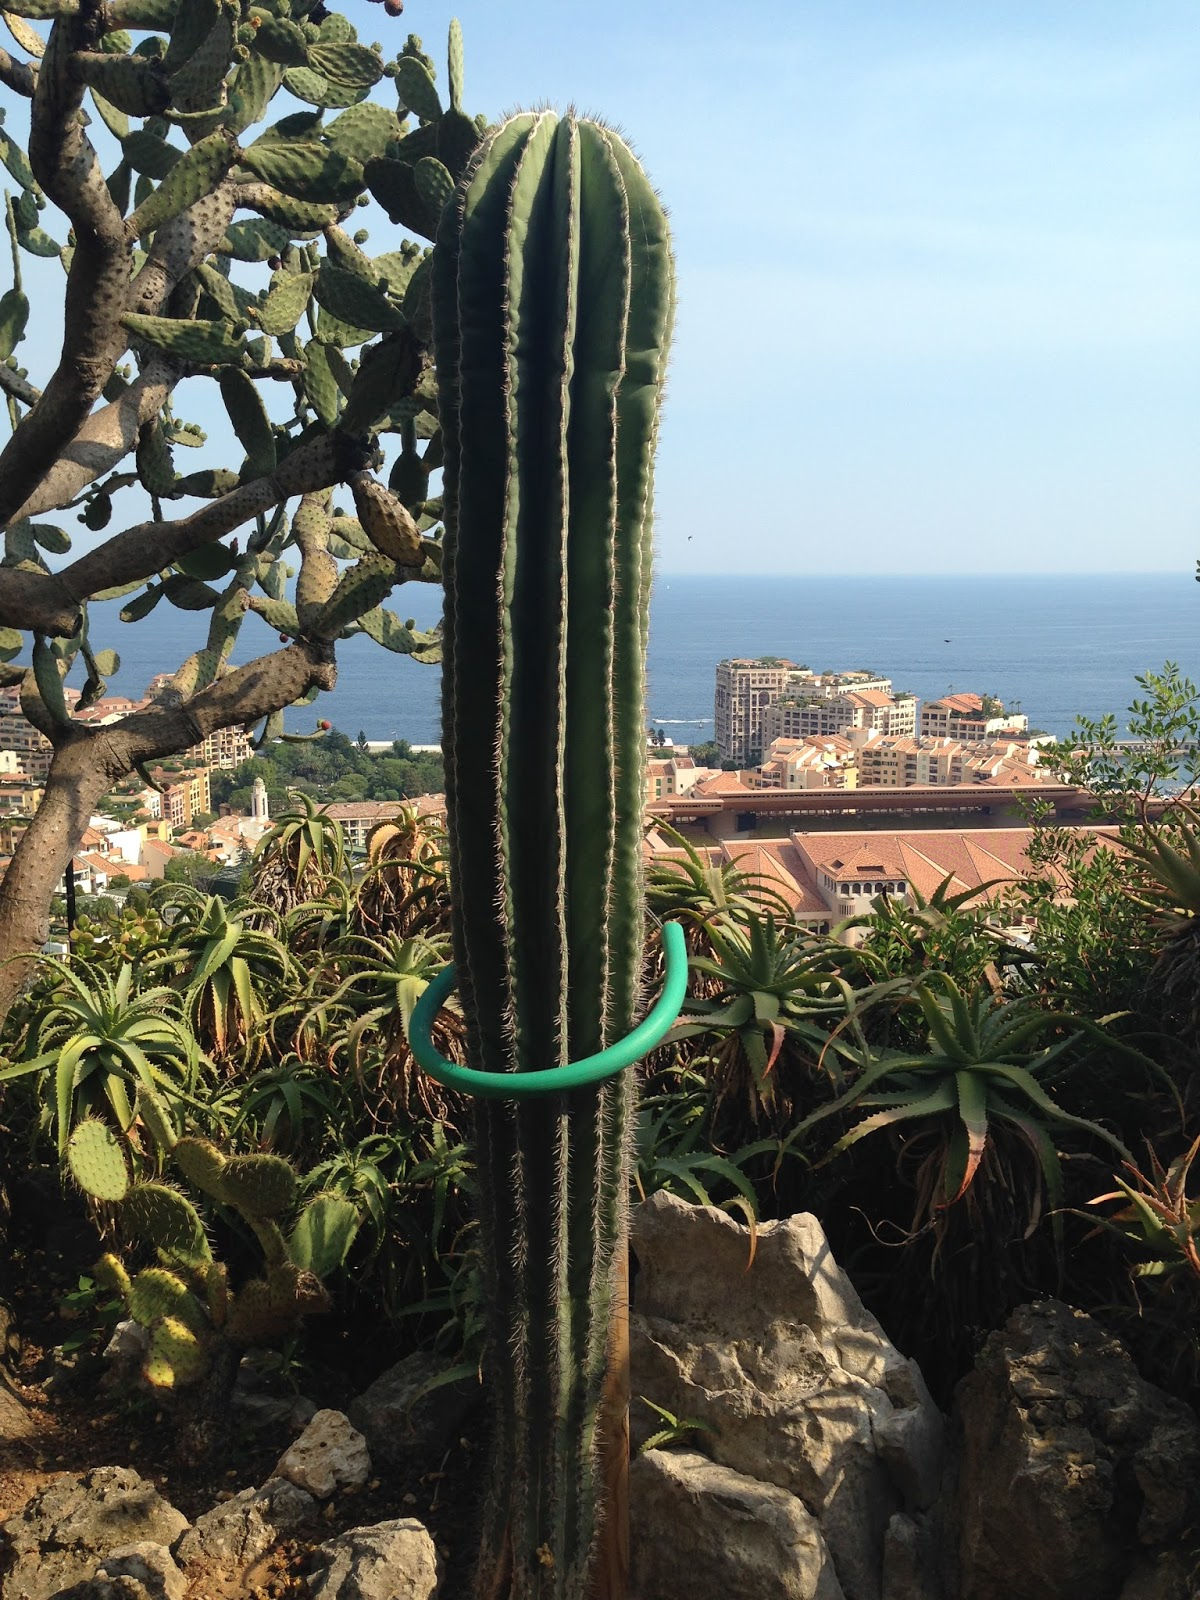 Succulent sundae jardin exotique monaco part 4 for Jardin exotique